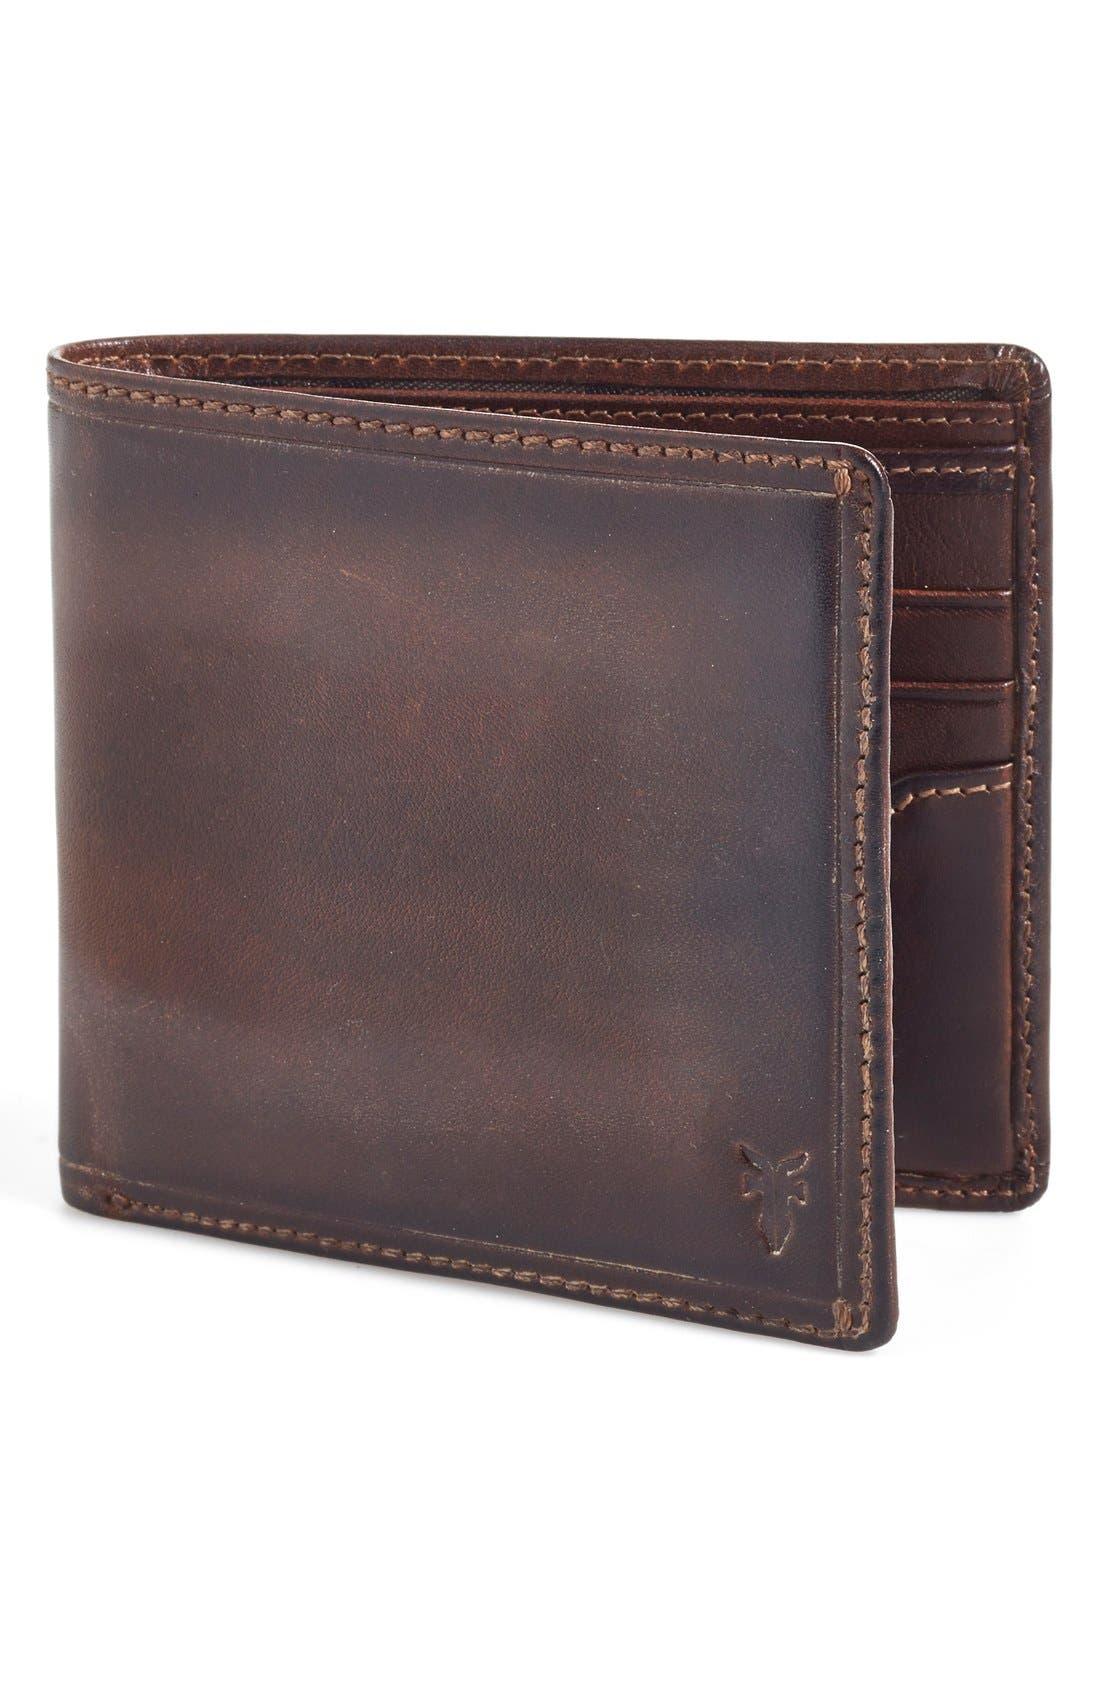 Main Image - Frye 'Logan' Leather Billfold Wallet (Online Only)